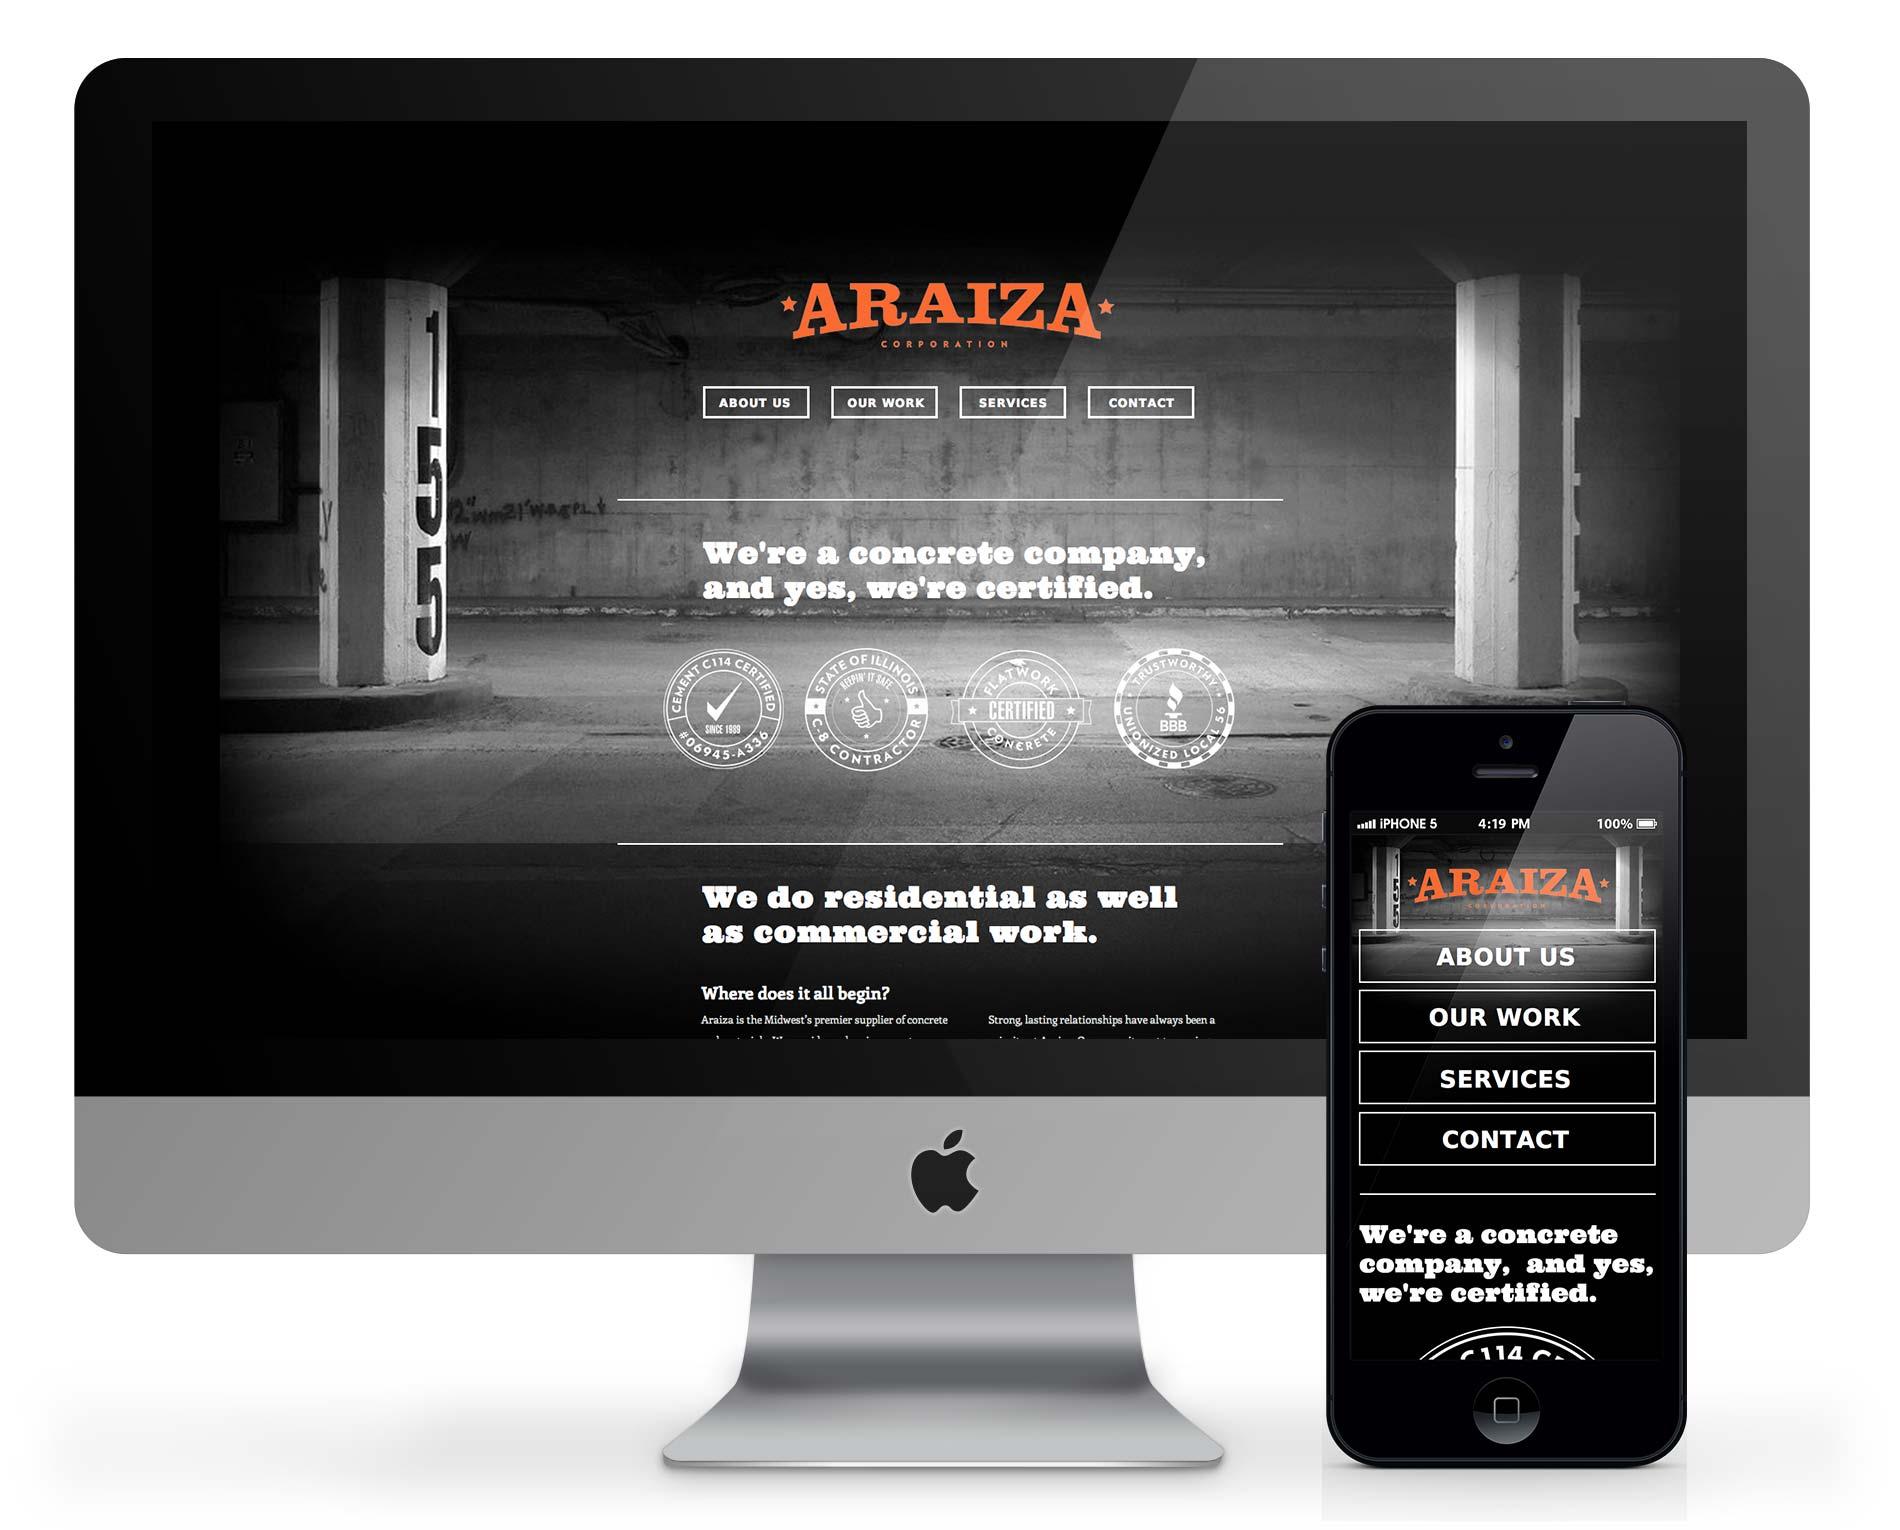 Araiza_Corporation